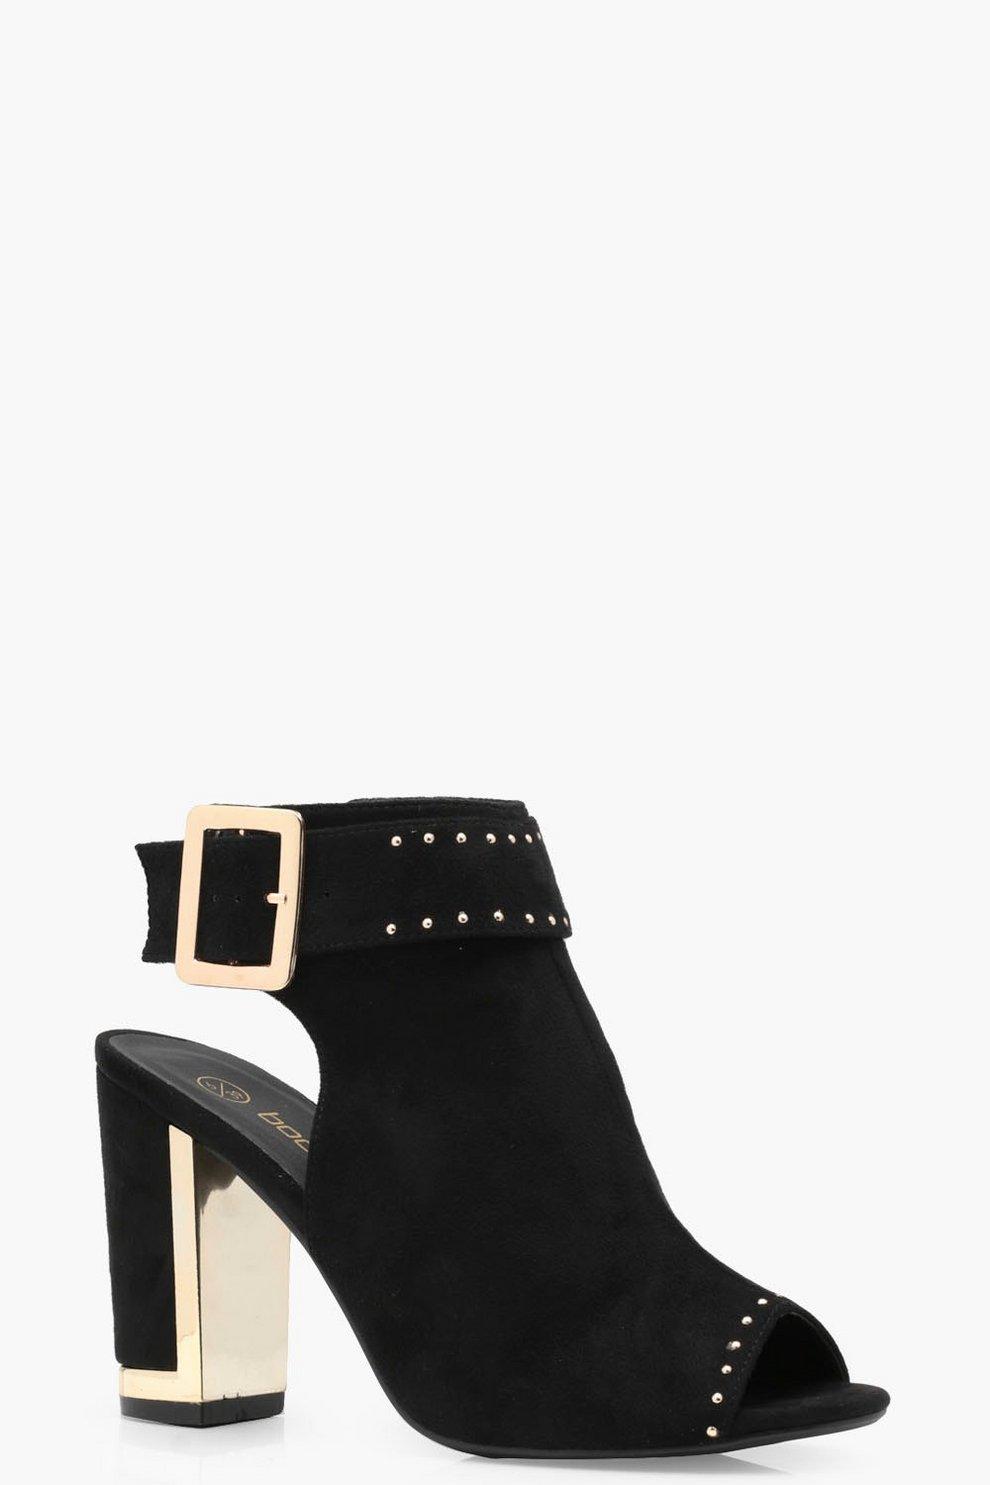 Olivia Plaited & Studded Shoe Boots JKoxtD